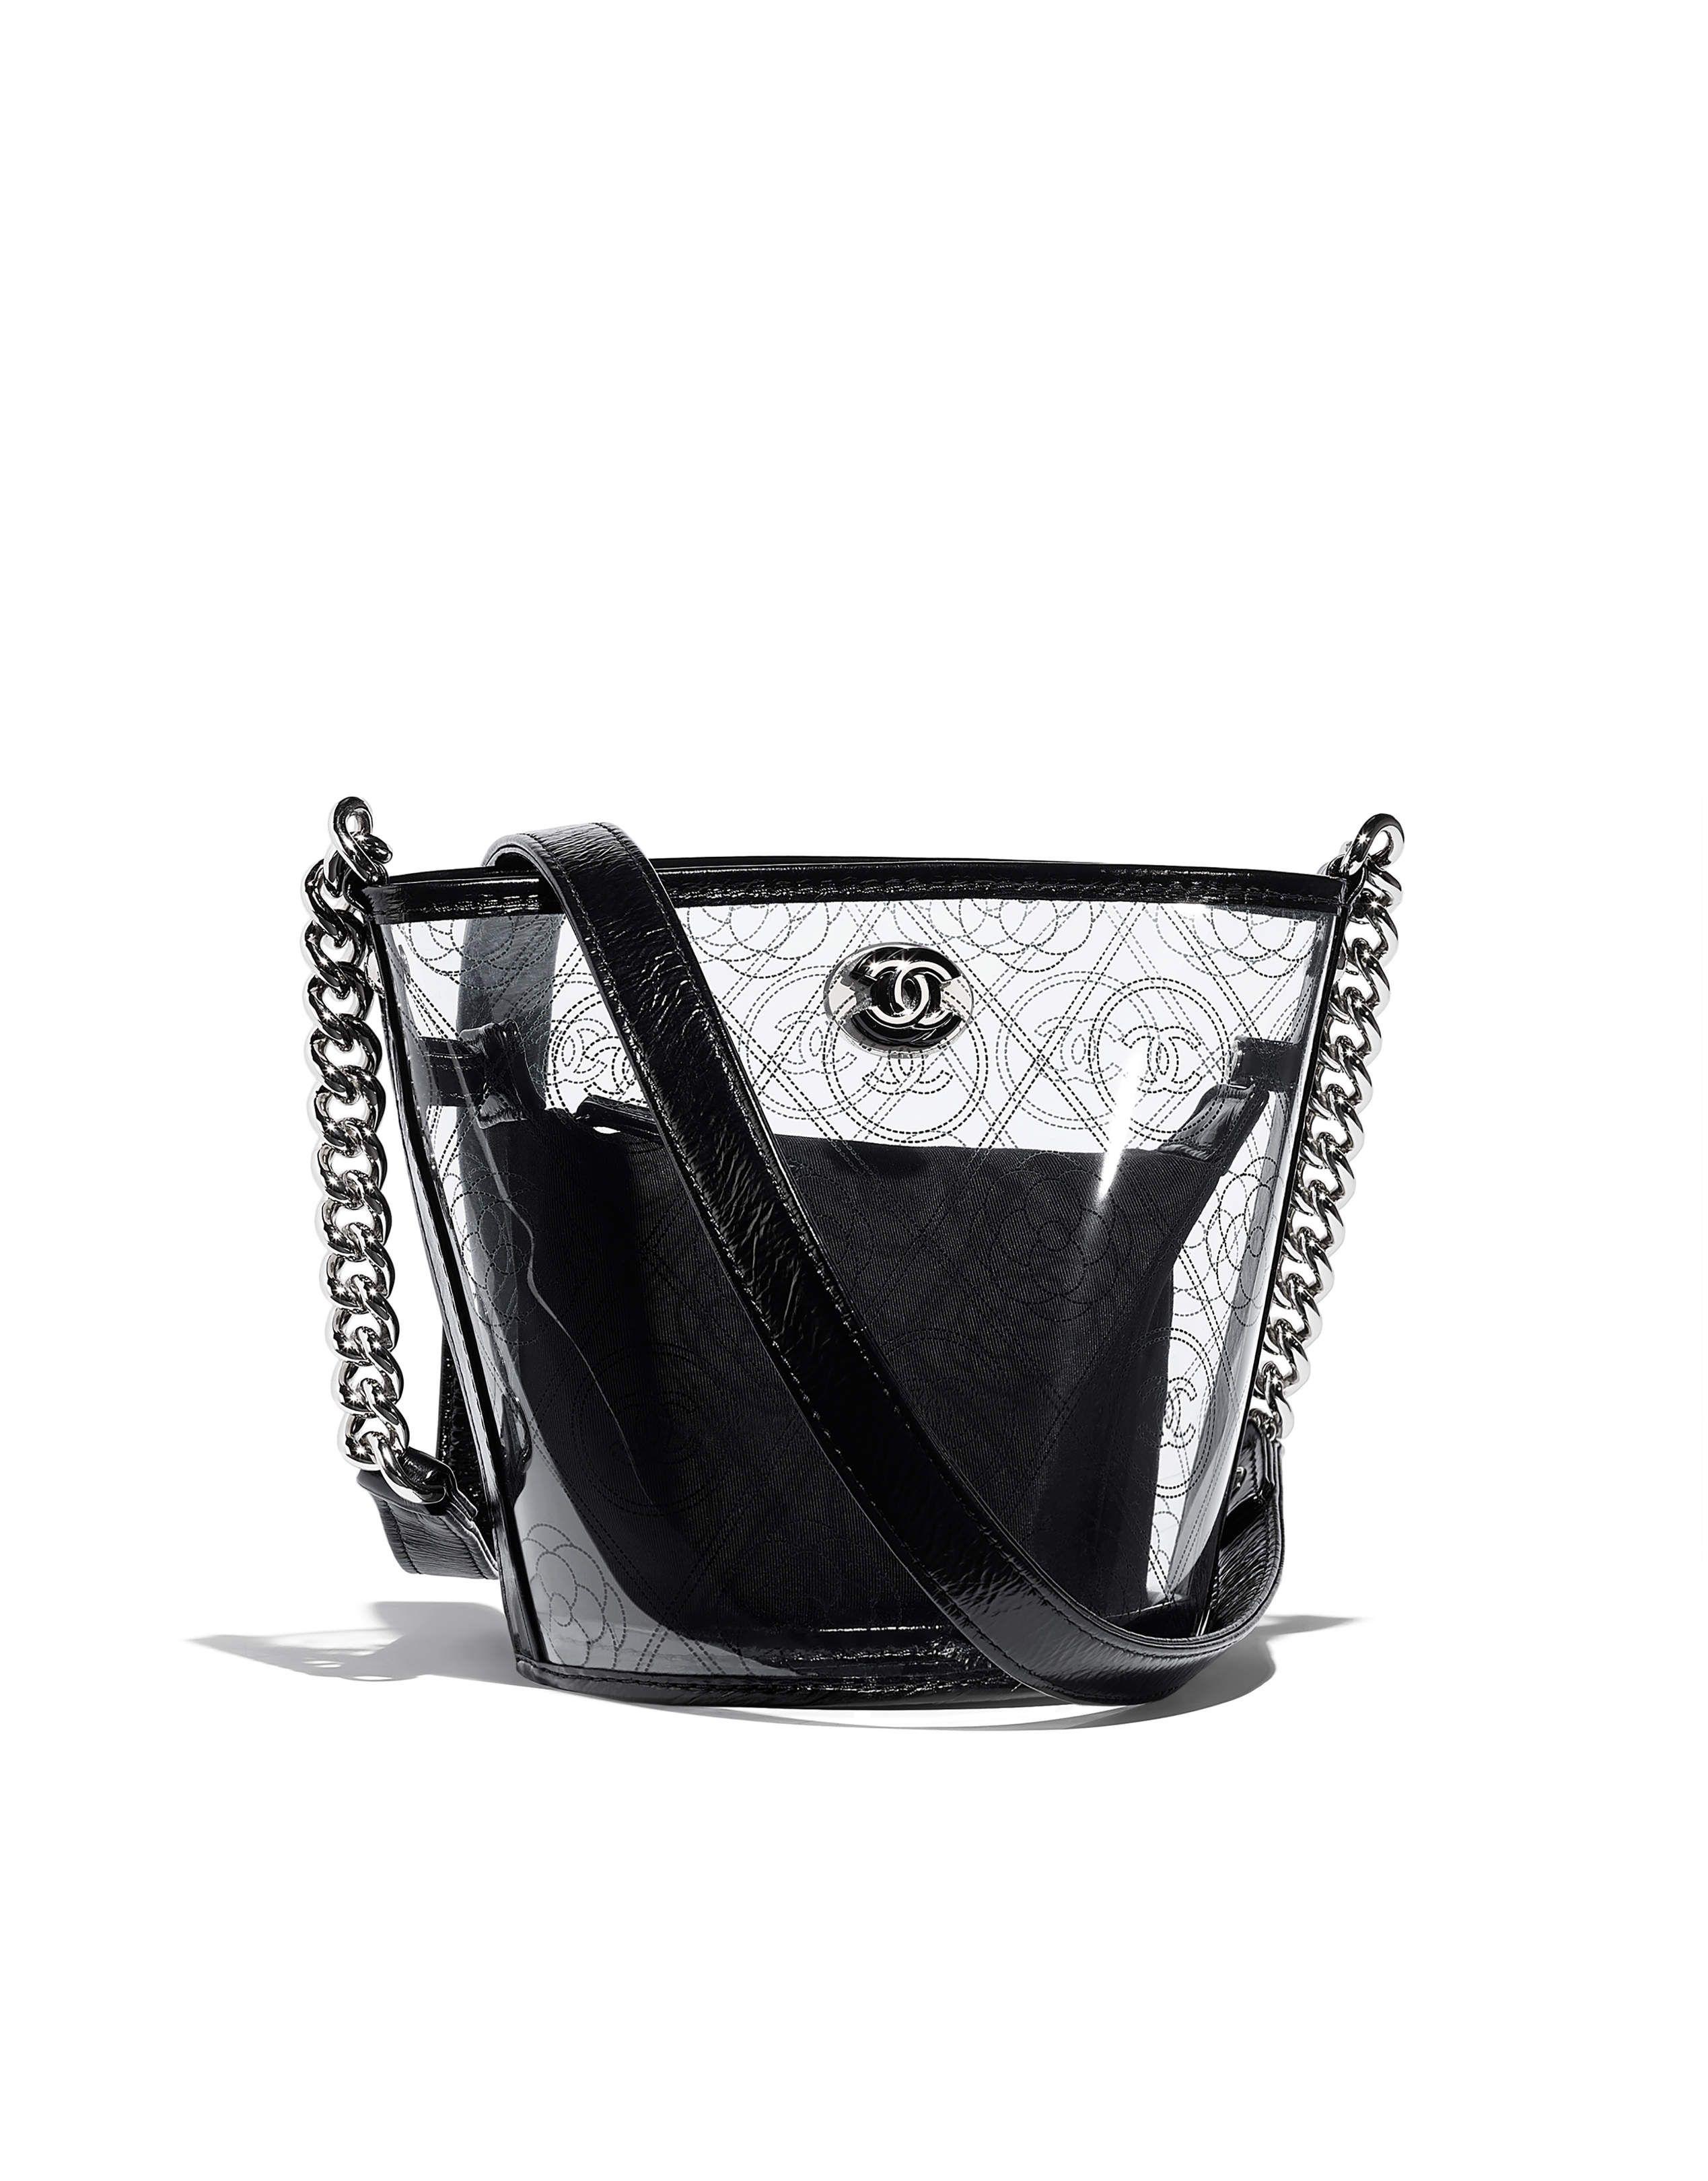 3ee4a45ad28f Chanel - SS2018   Black printed PVC bucket bag   BAGS   Chanel ...